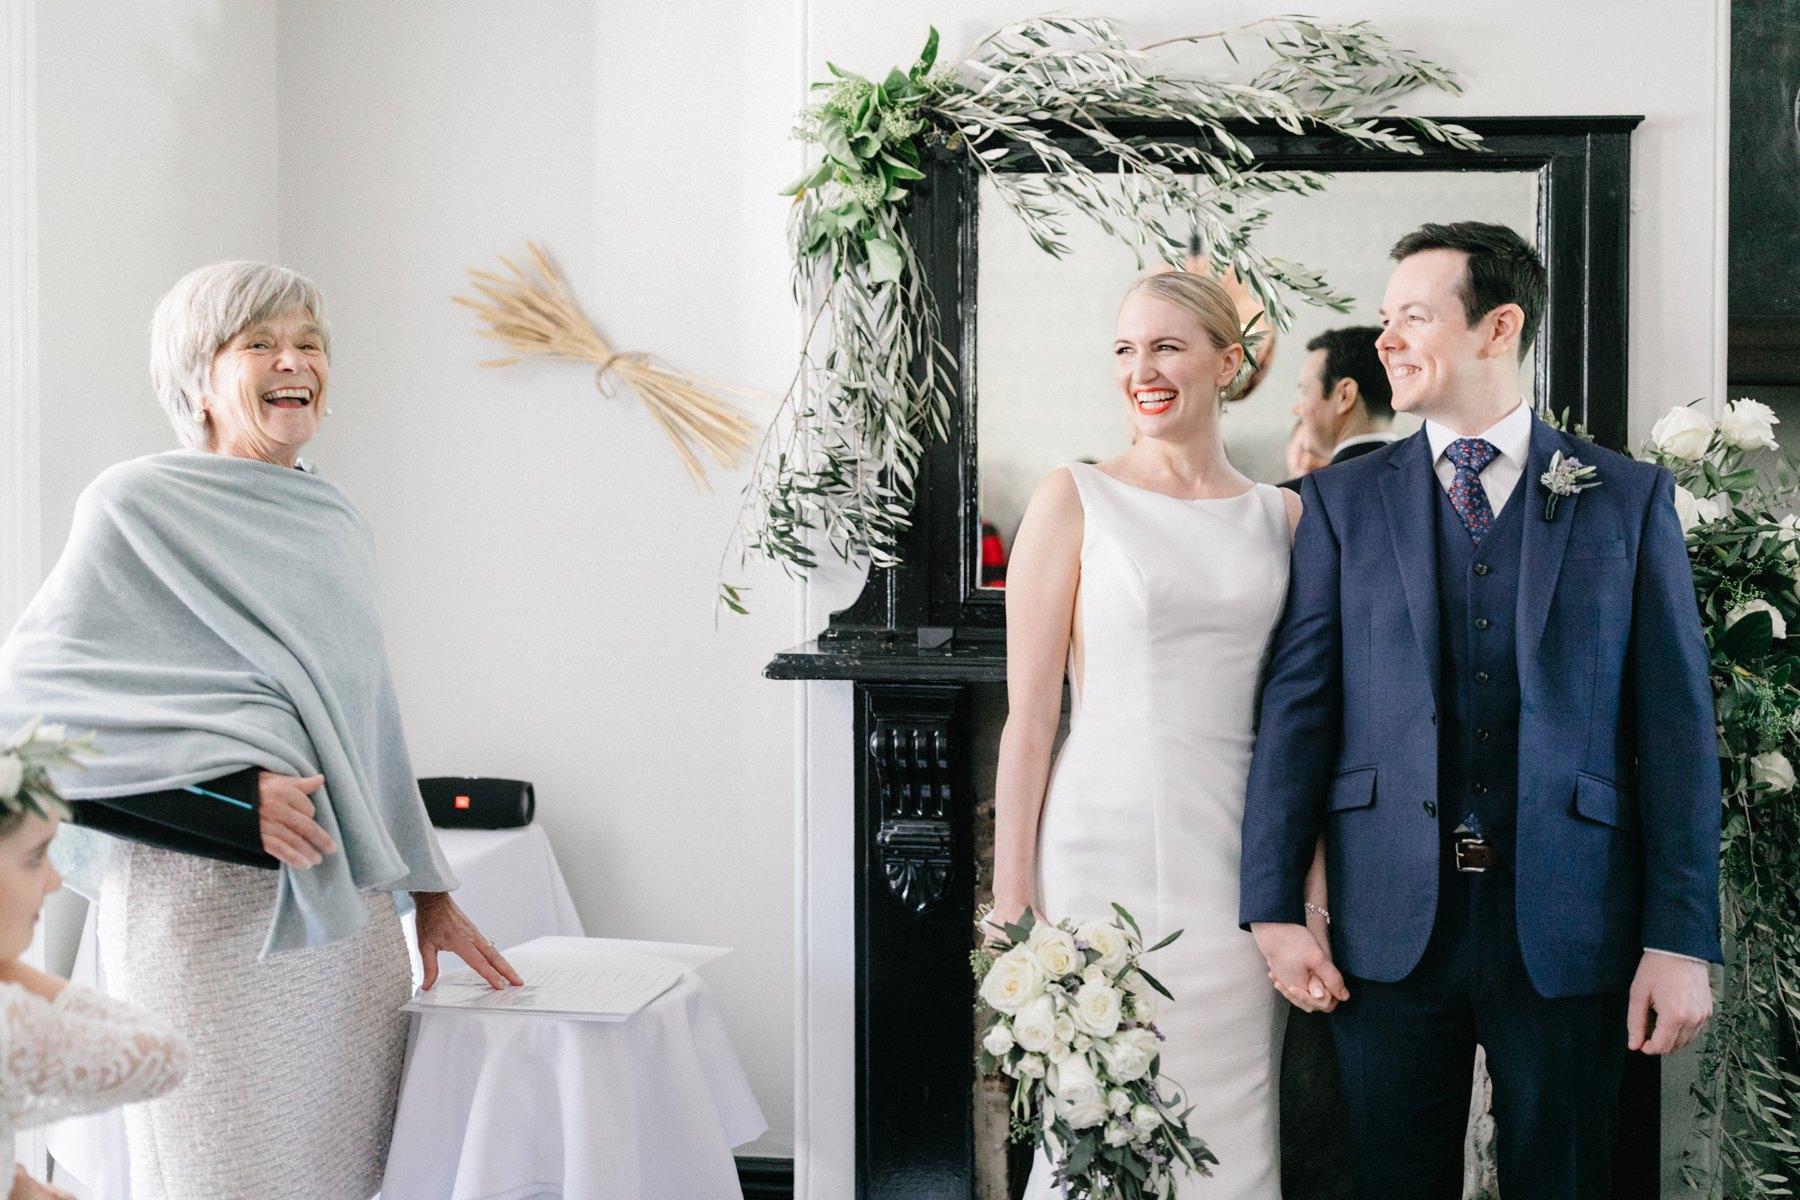 celebrant marrying a couple sydney wedding